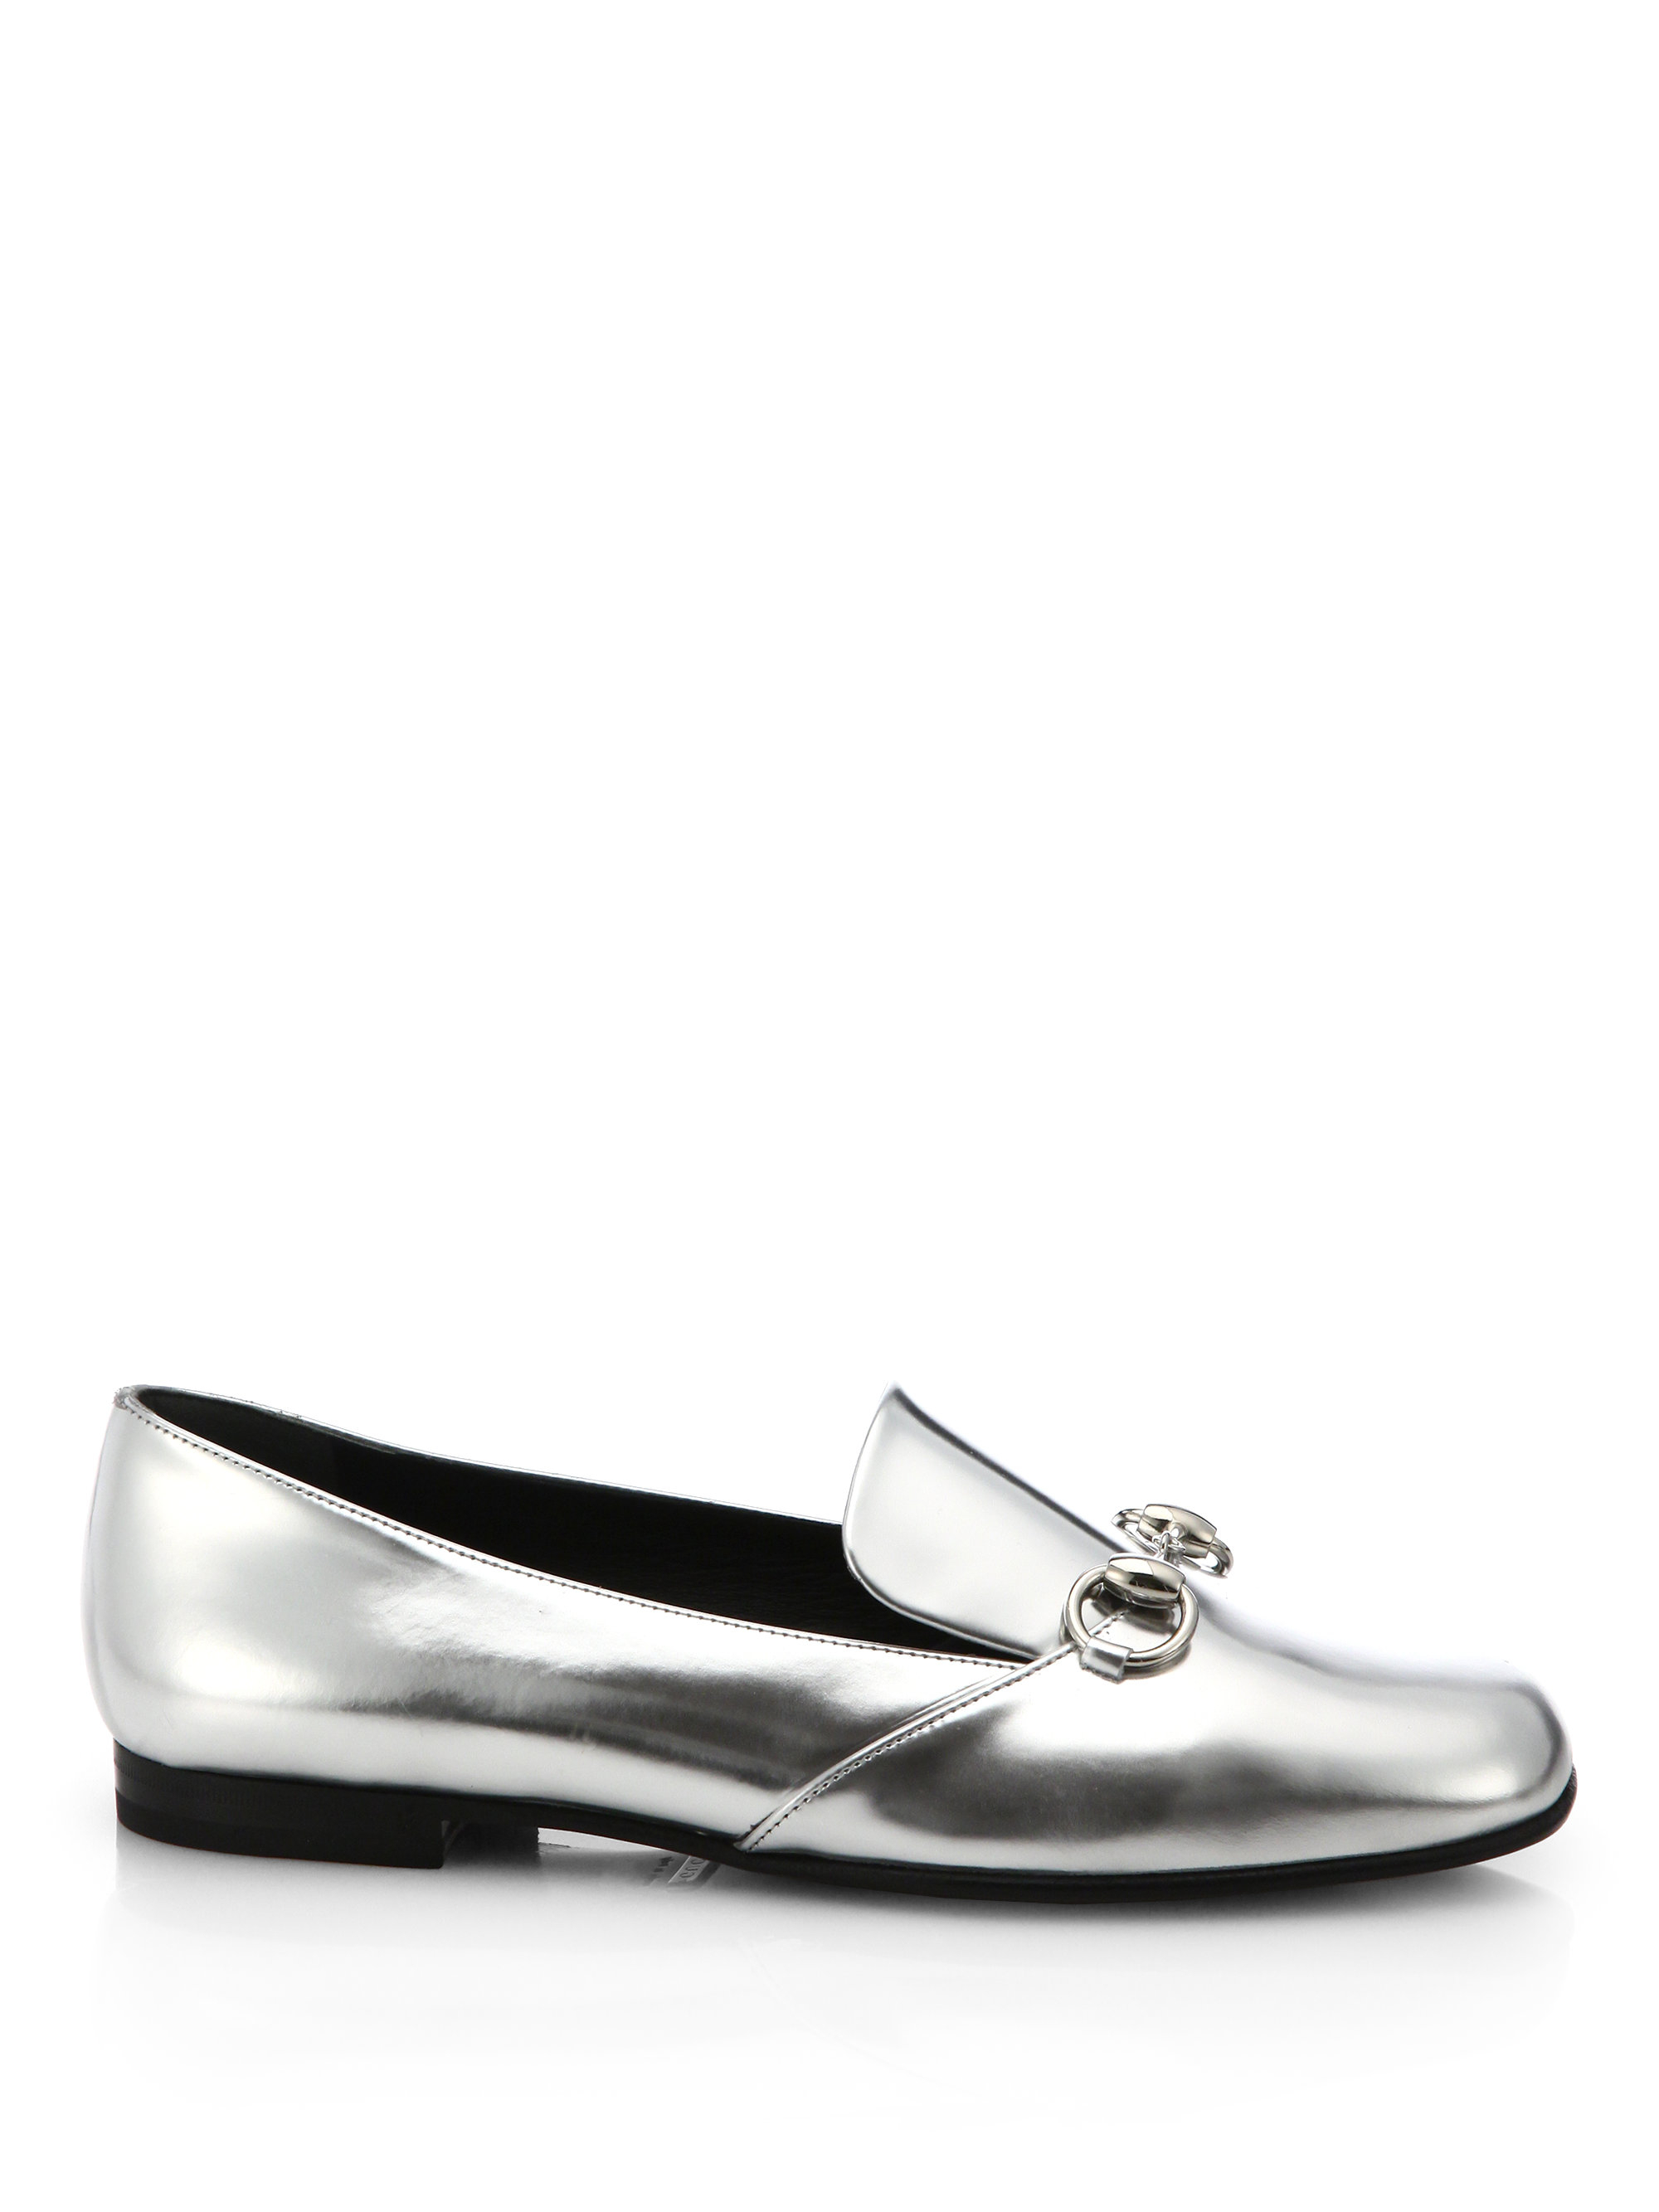 446ec4b77 Gucci Kira Metallic Leather Loafers in Metallic for Men - Lyst